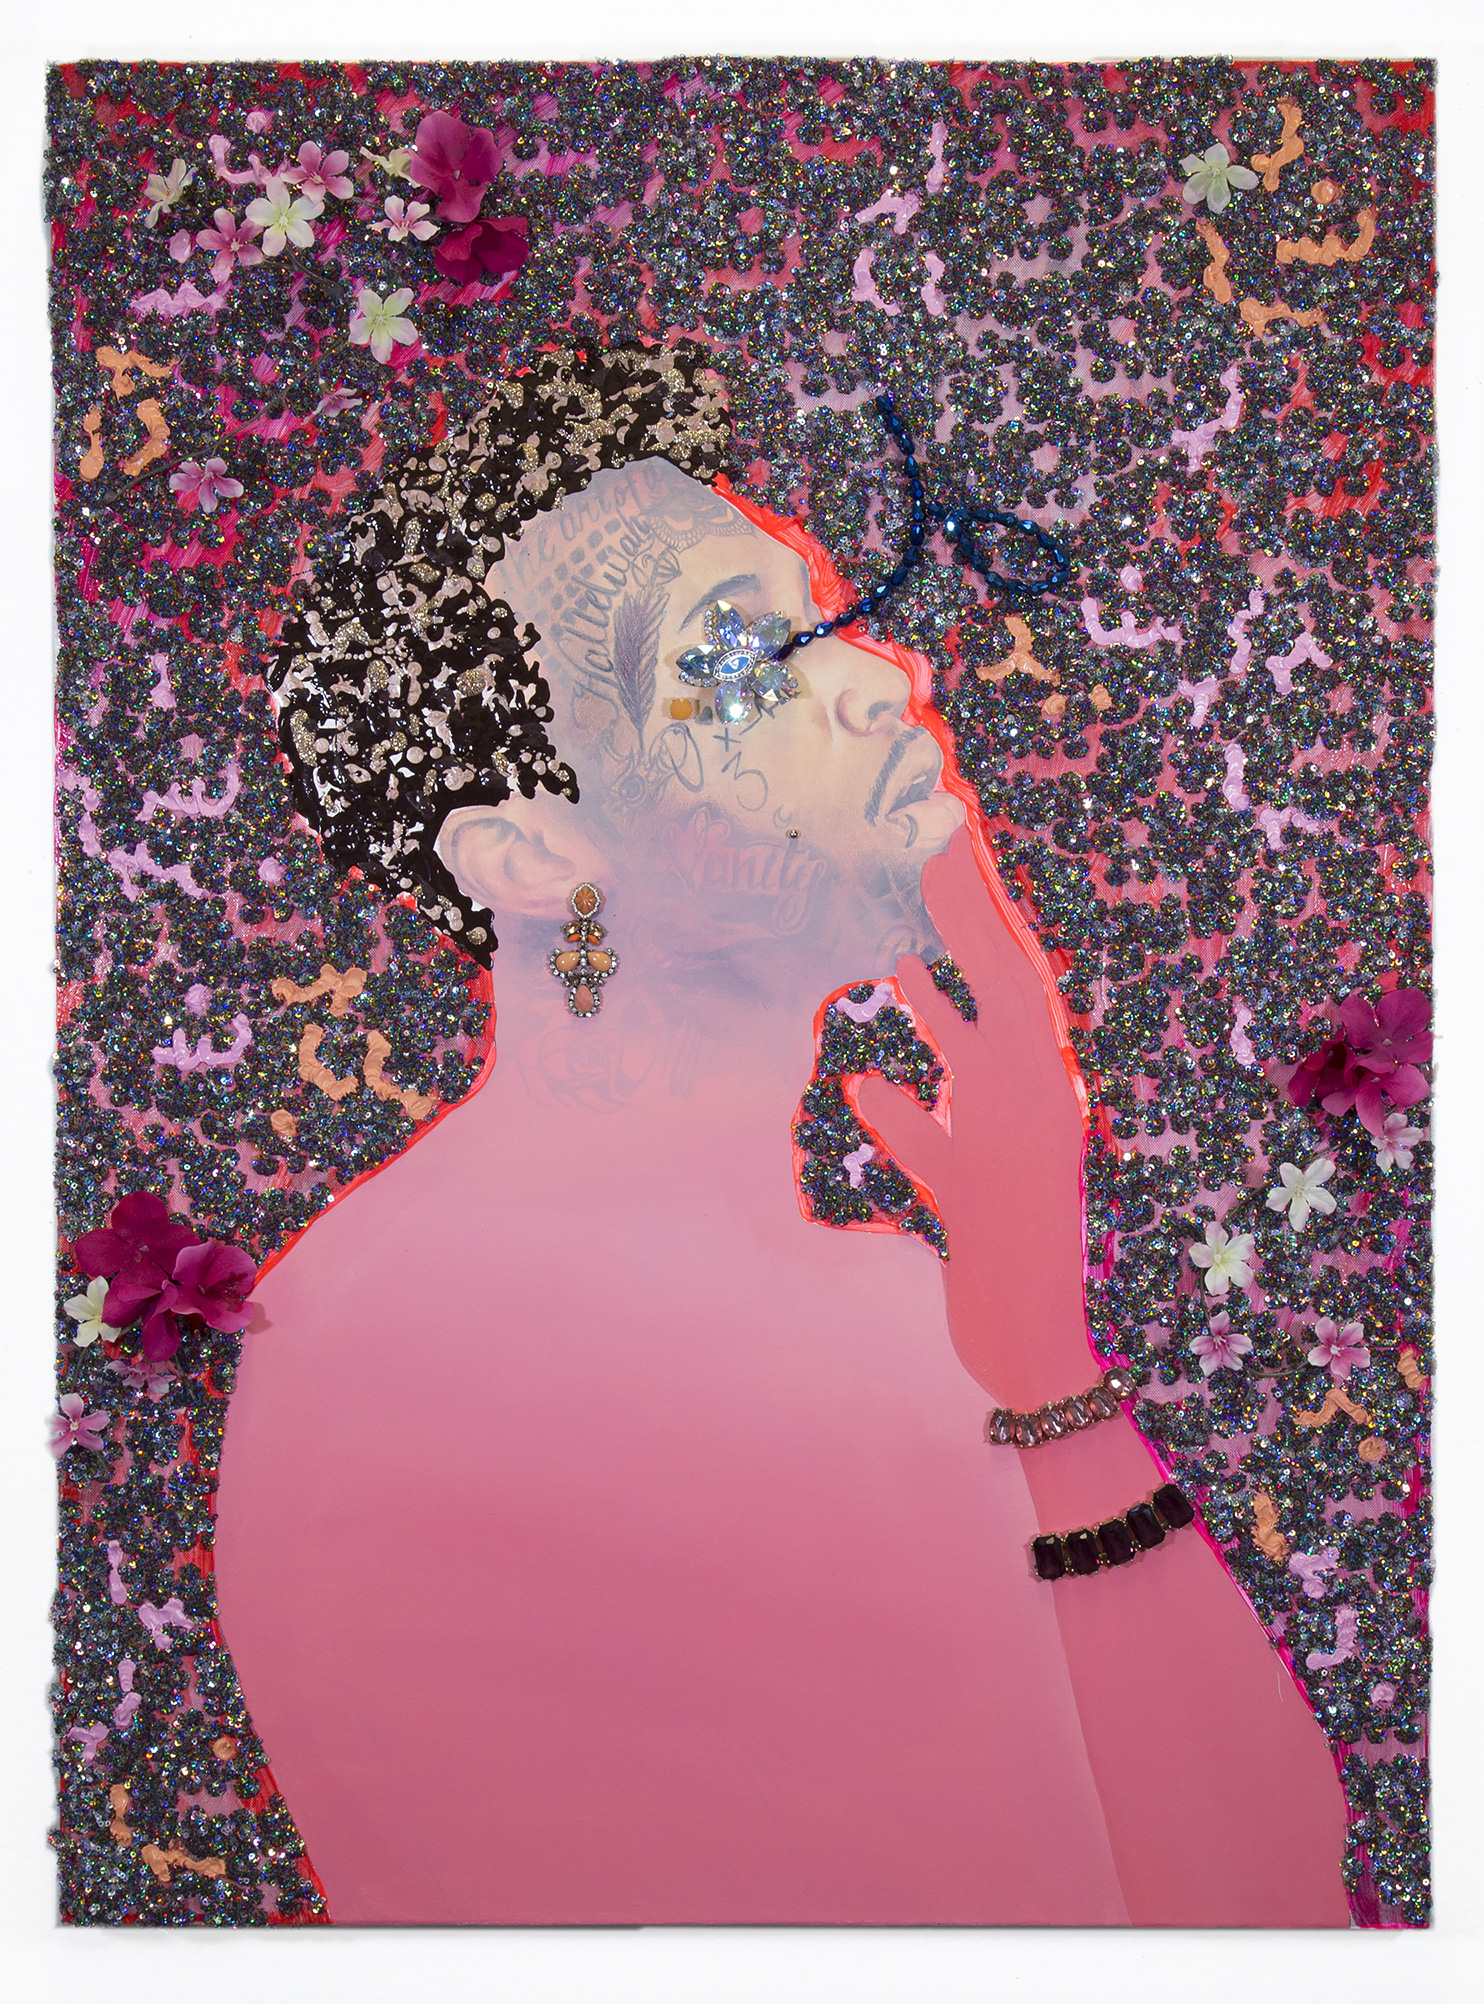 Devan Shimoyama Is the Winner of the 2016 PULSE Prize  artnet News